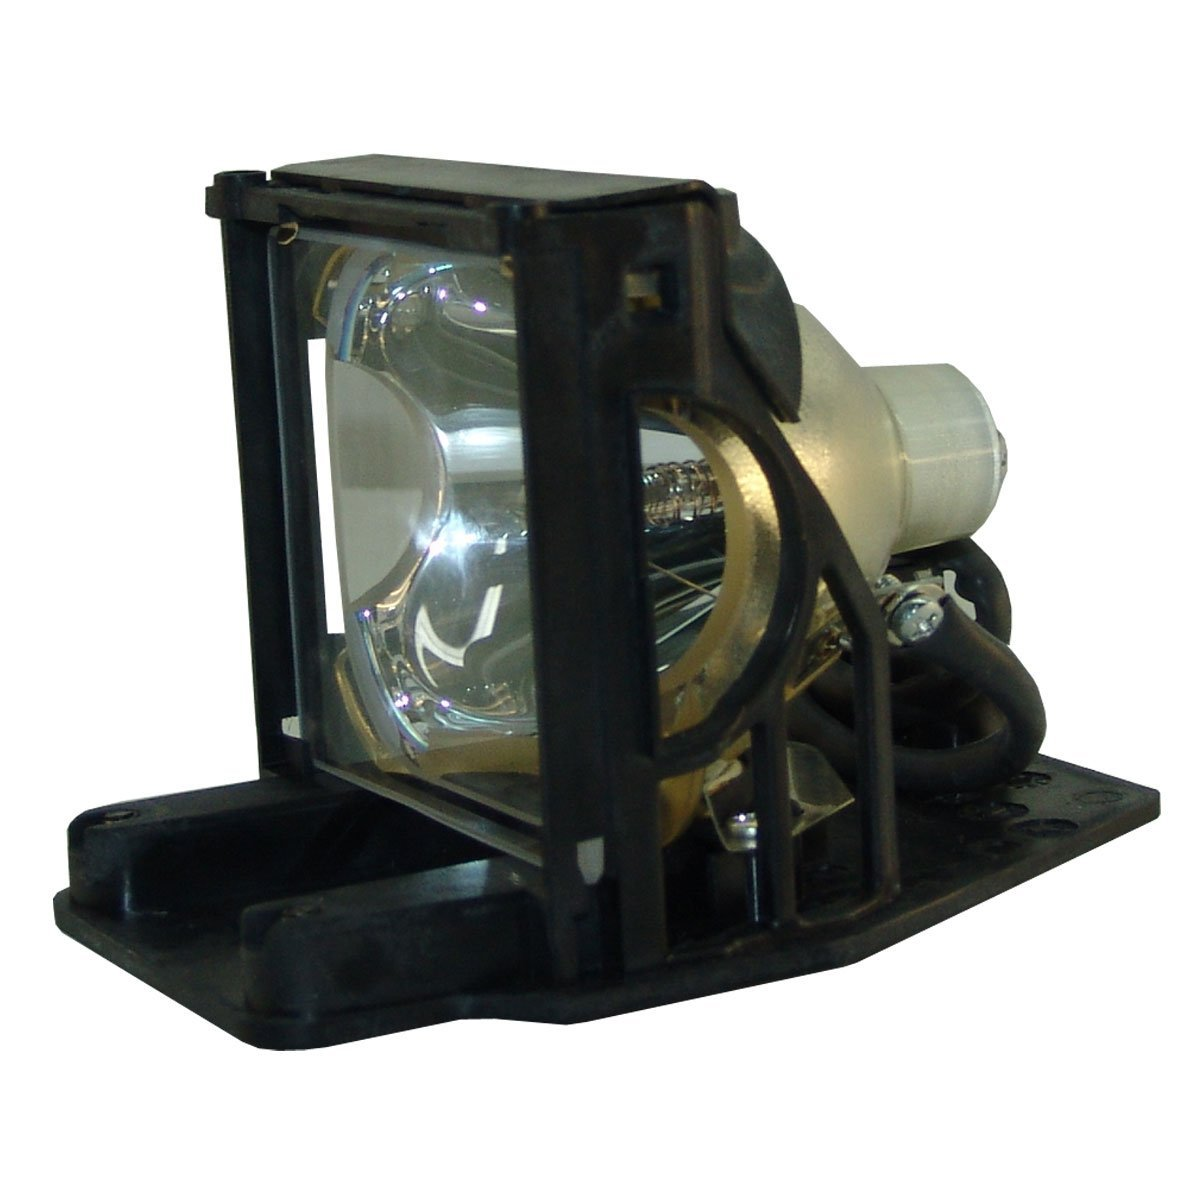 SP-LAMP-012 SPLAMP012 for InFocus LP815 LP820 / Proxima DP8200 DP8200X /Triumph M-800 /Ask Proxima C410 C420 Projector Lamp Bulb